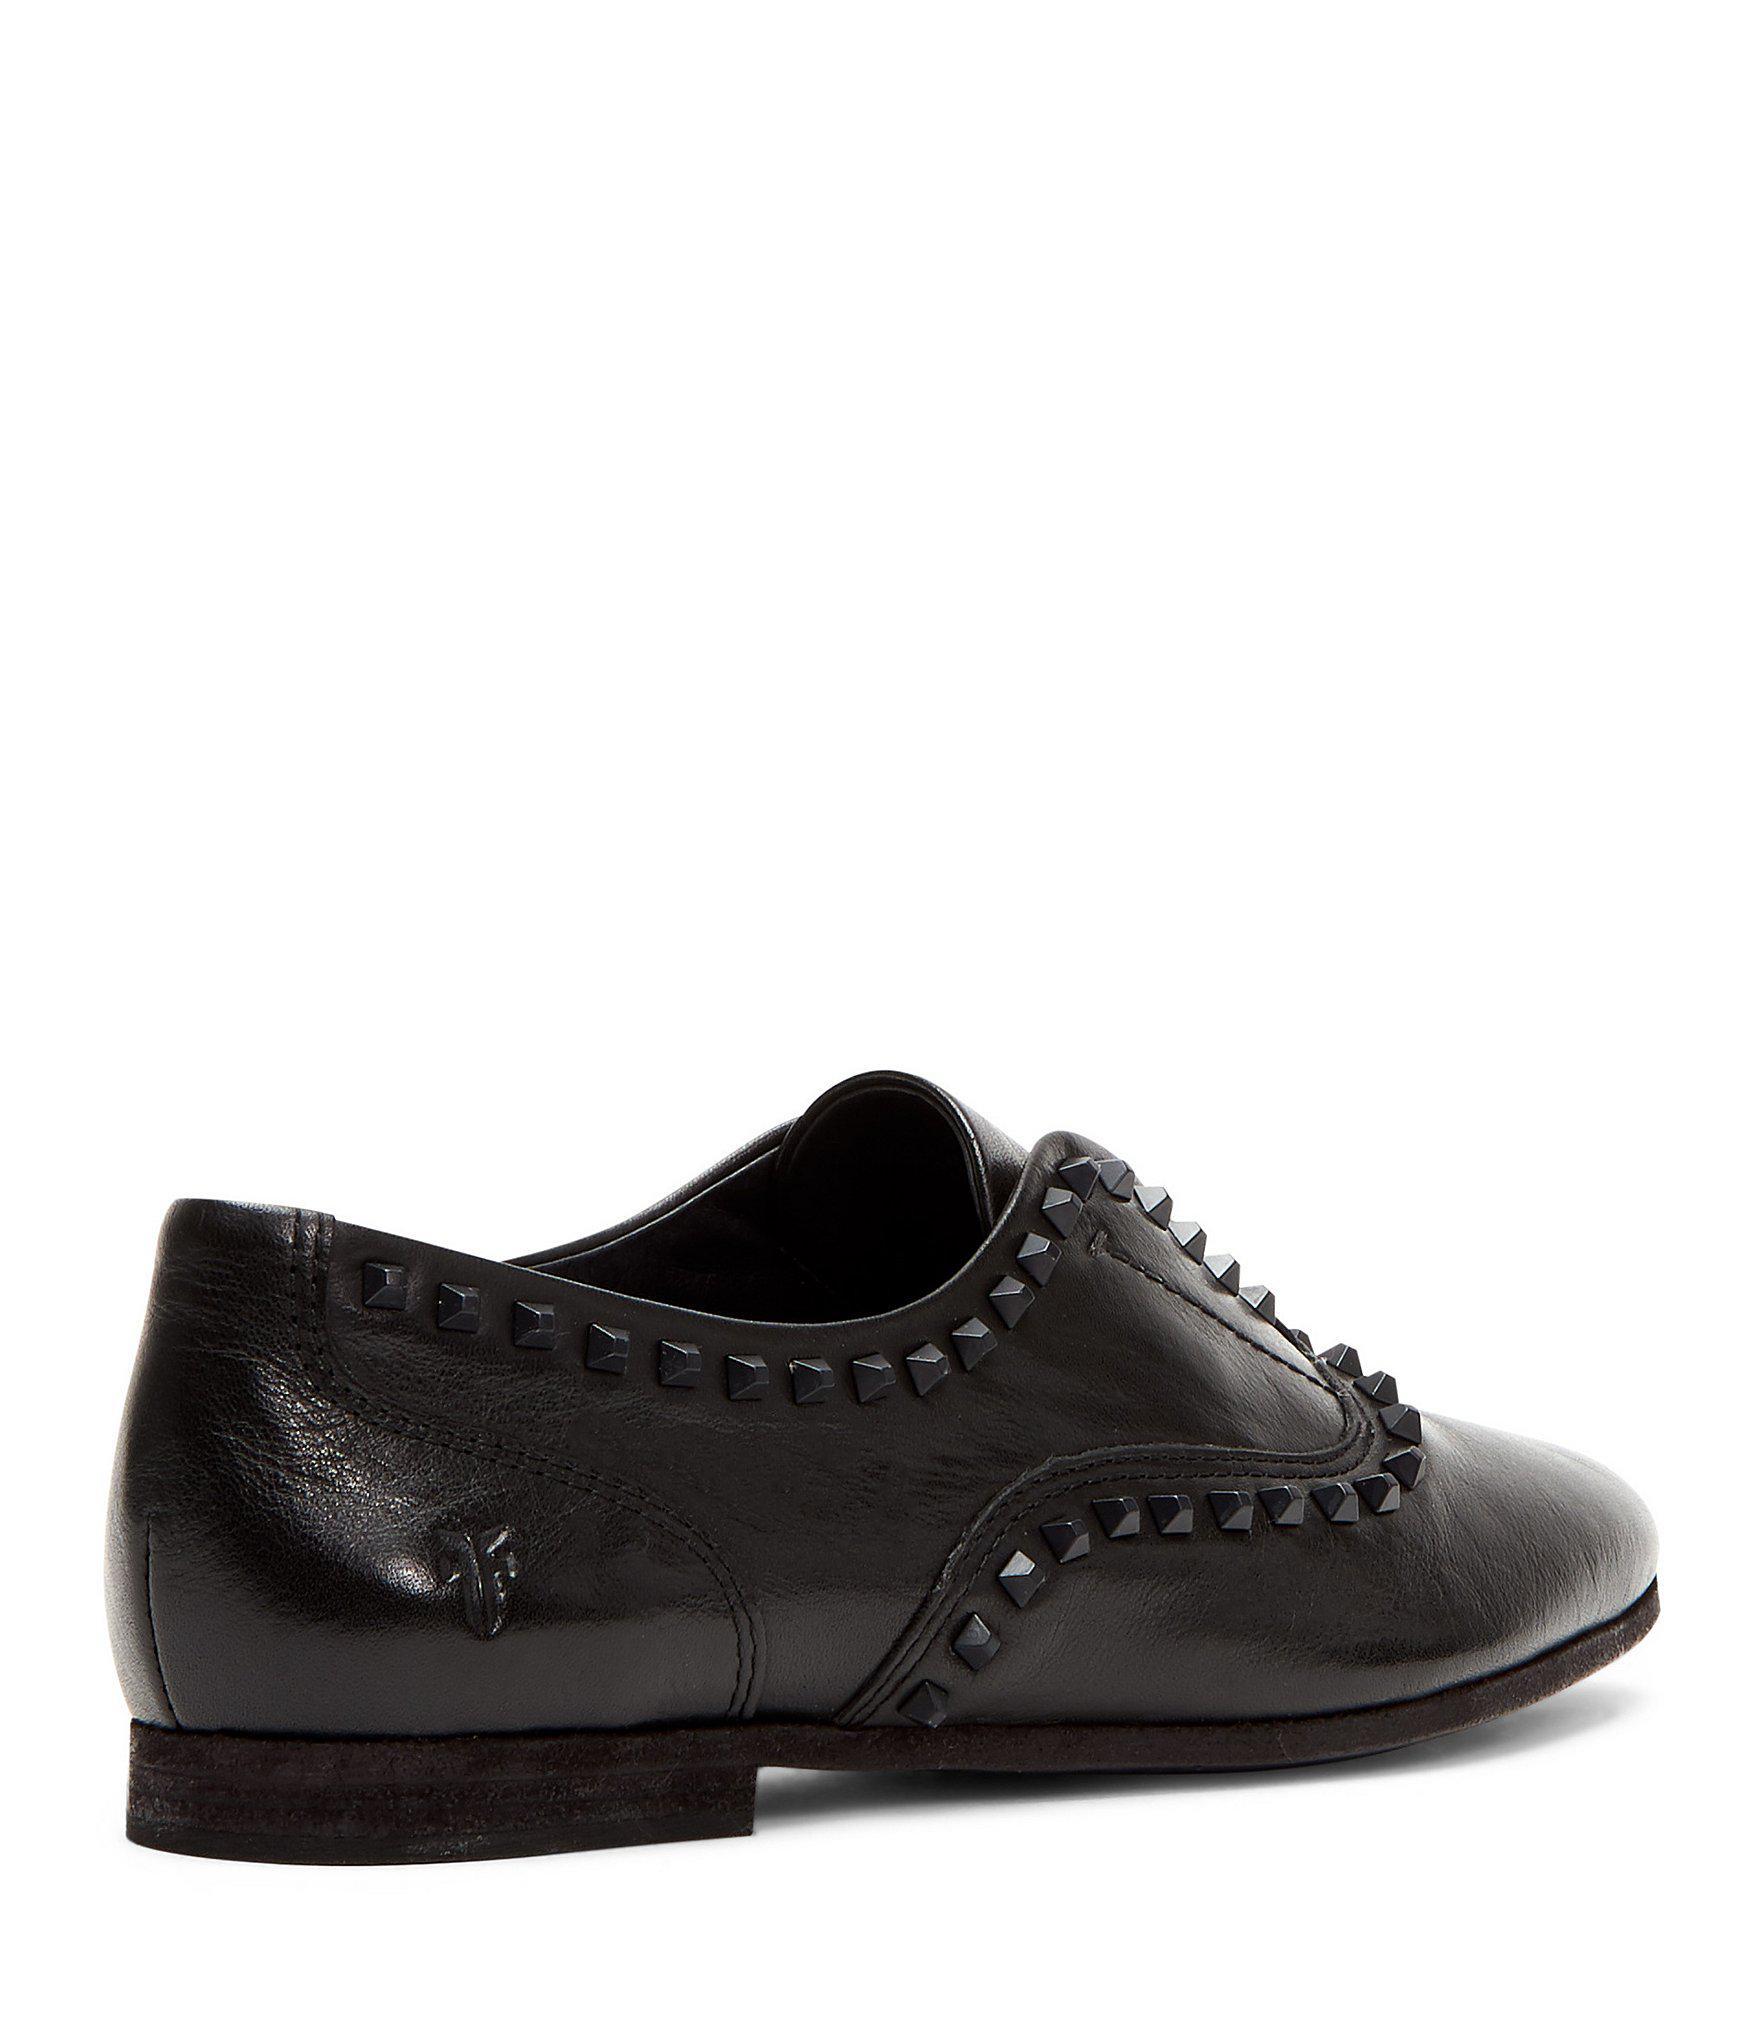 dacf883ac46 Frye - Black Terri Deco Stud Slip On Leather Oxfords - Lyst. View fullscreen